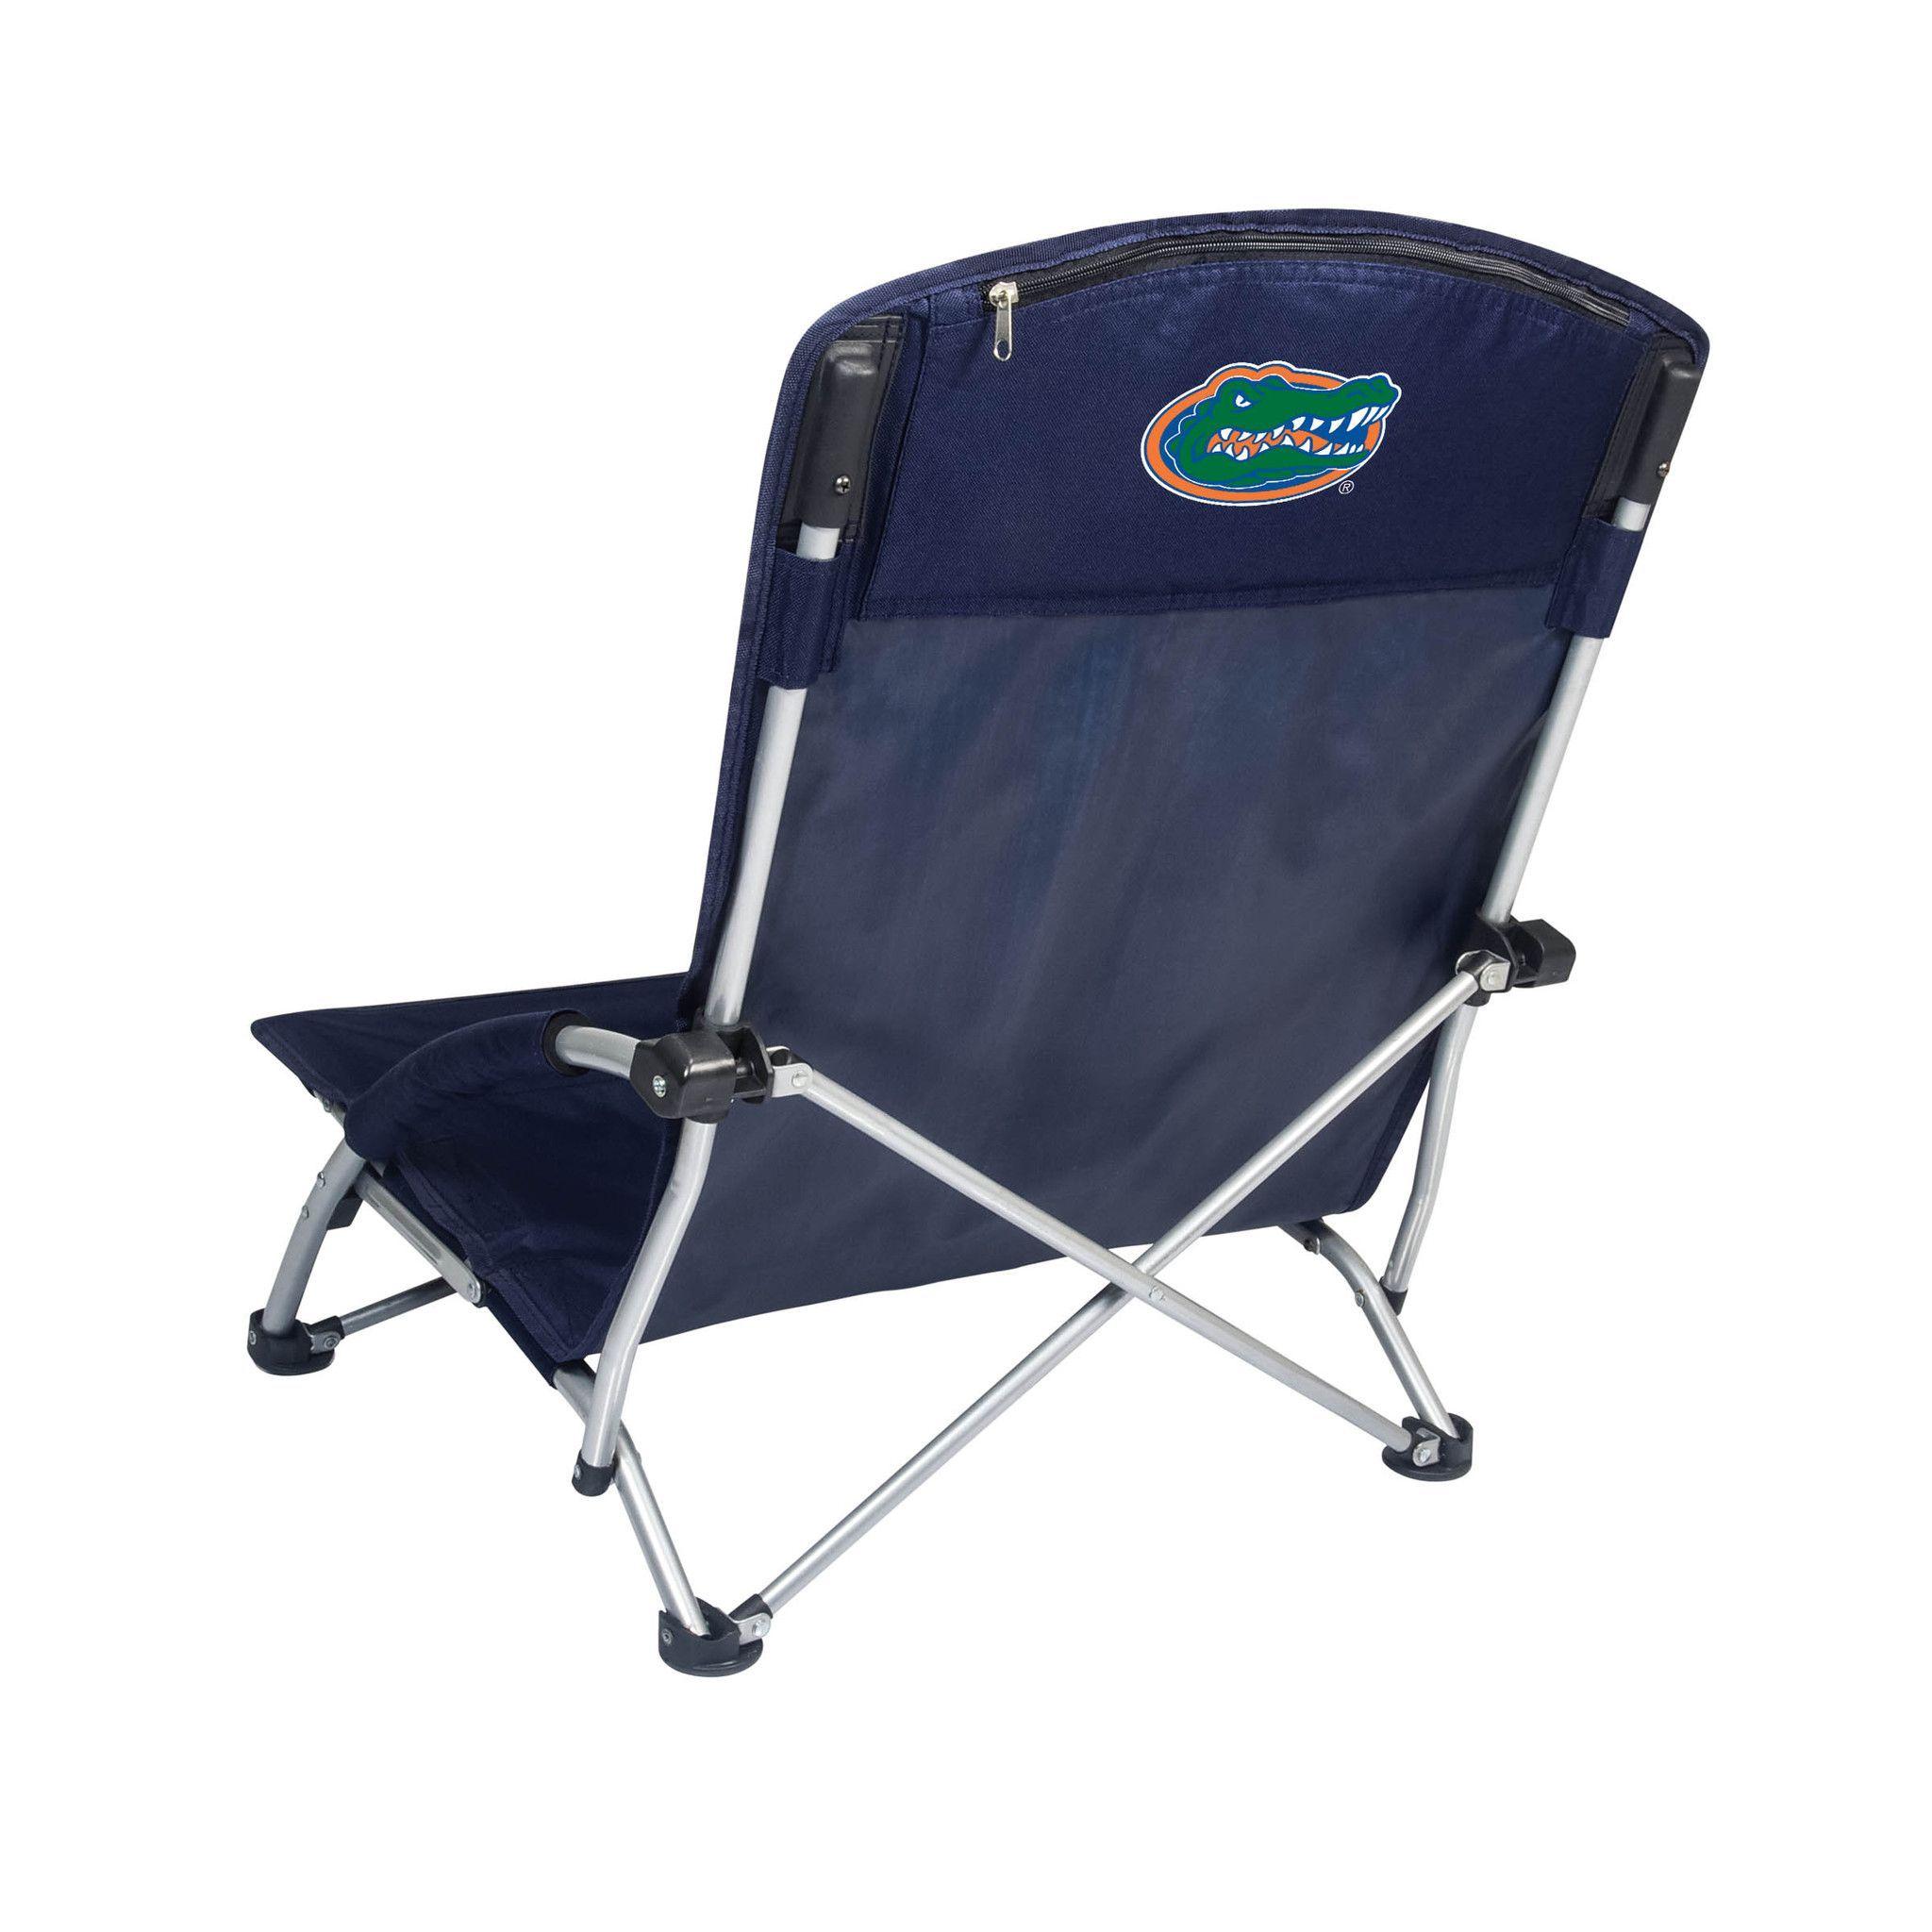 Tranquility Portable Beach Chair - Florida Gators